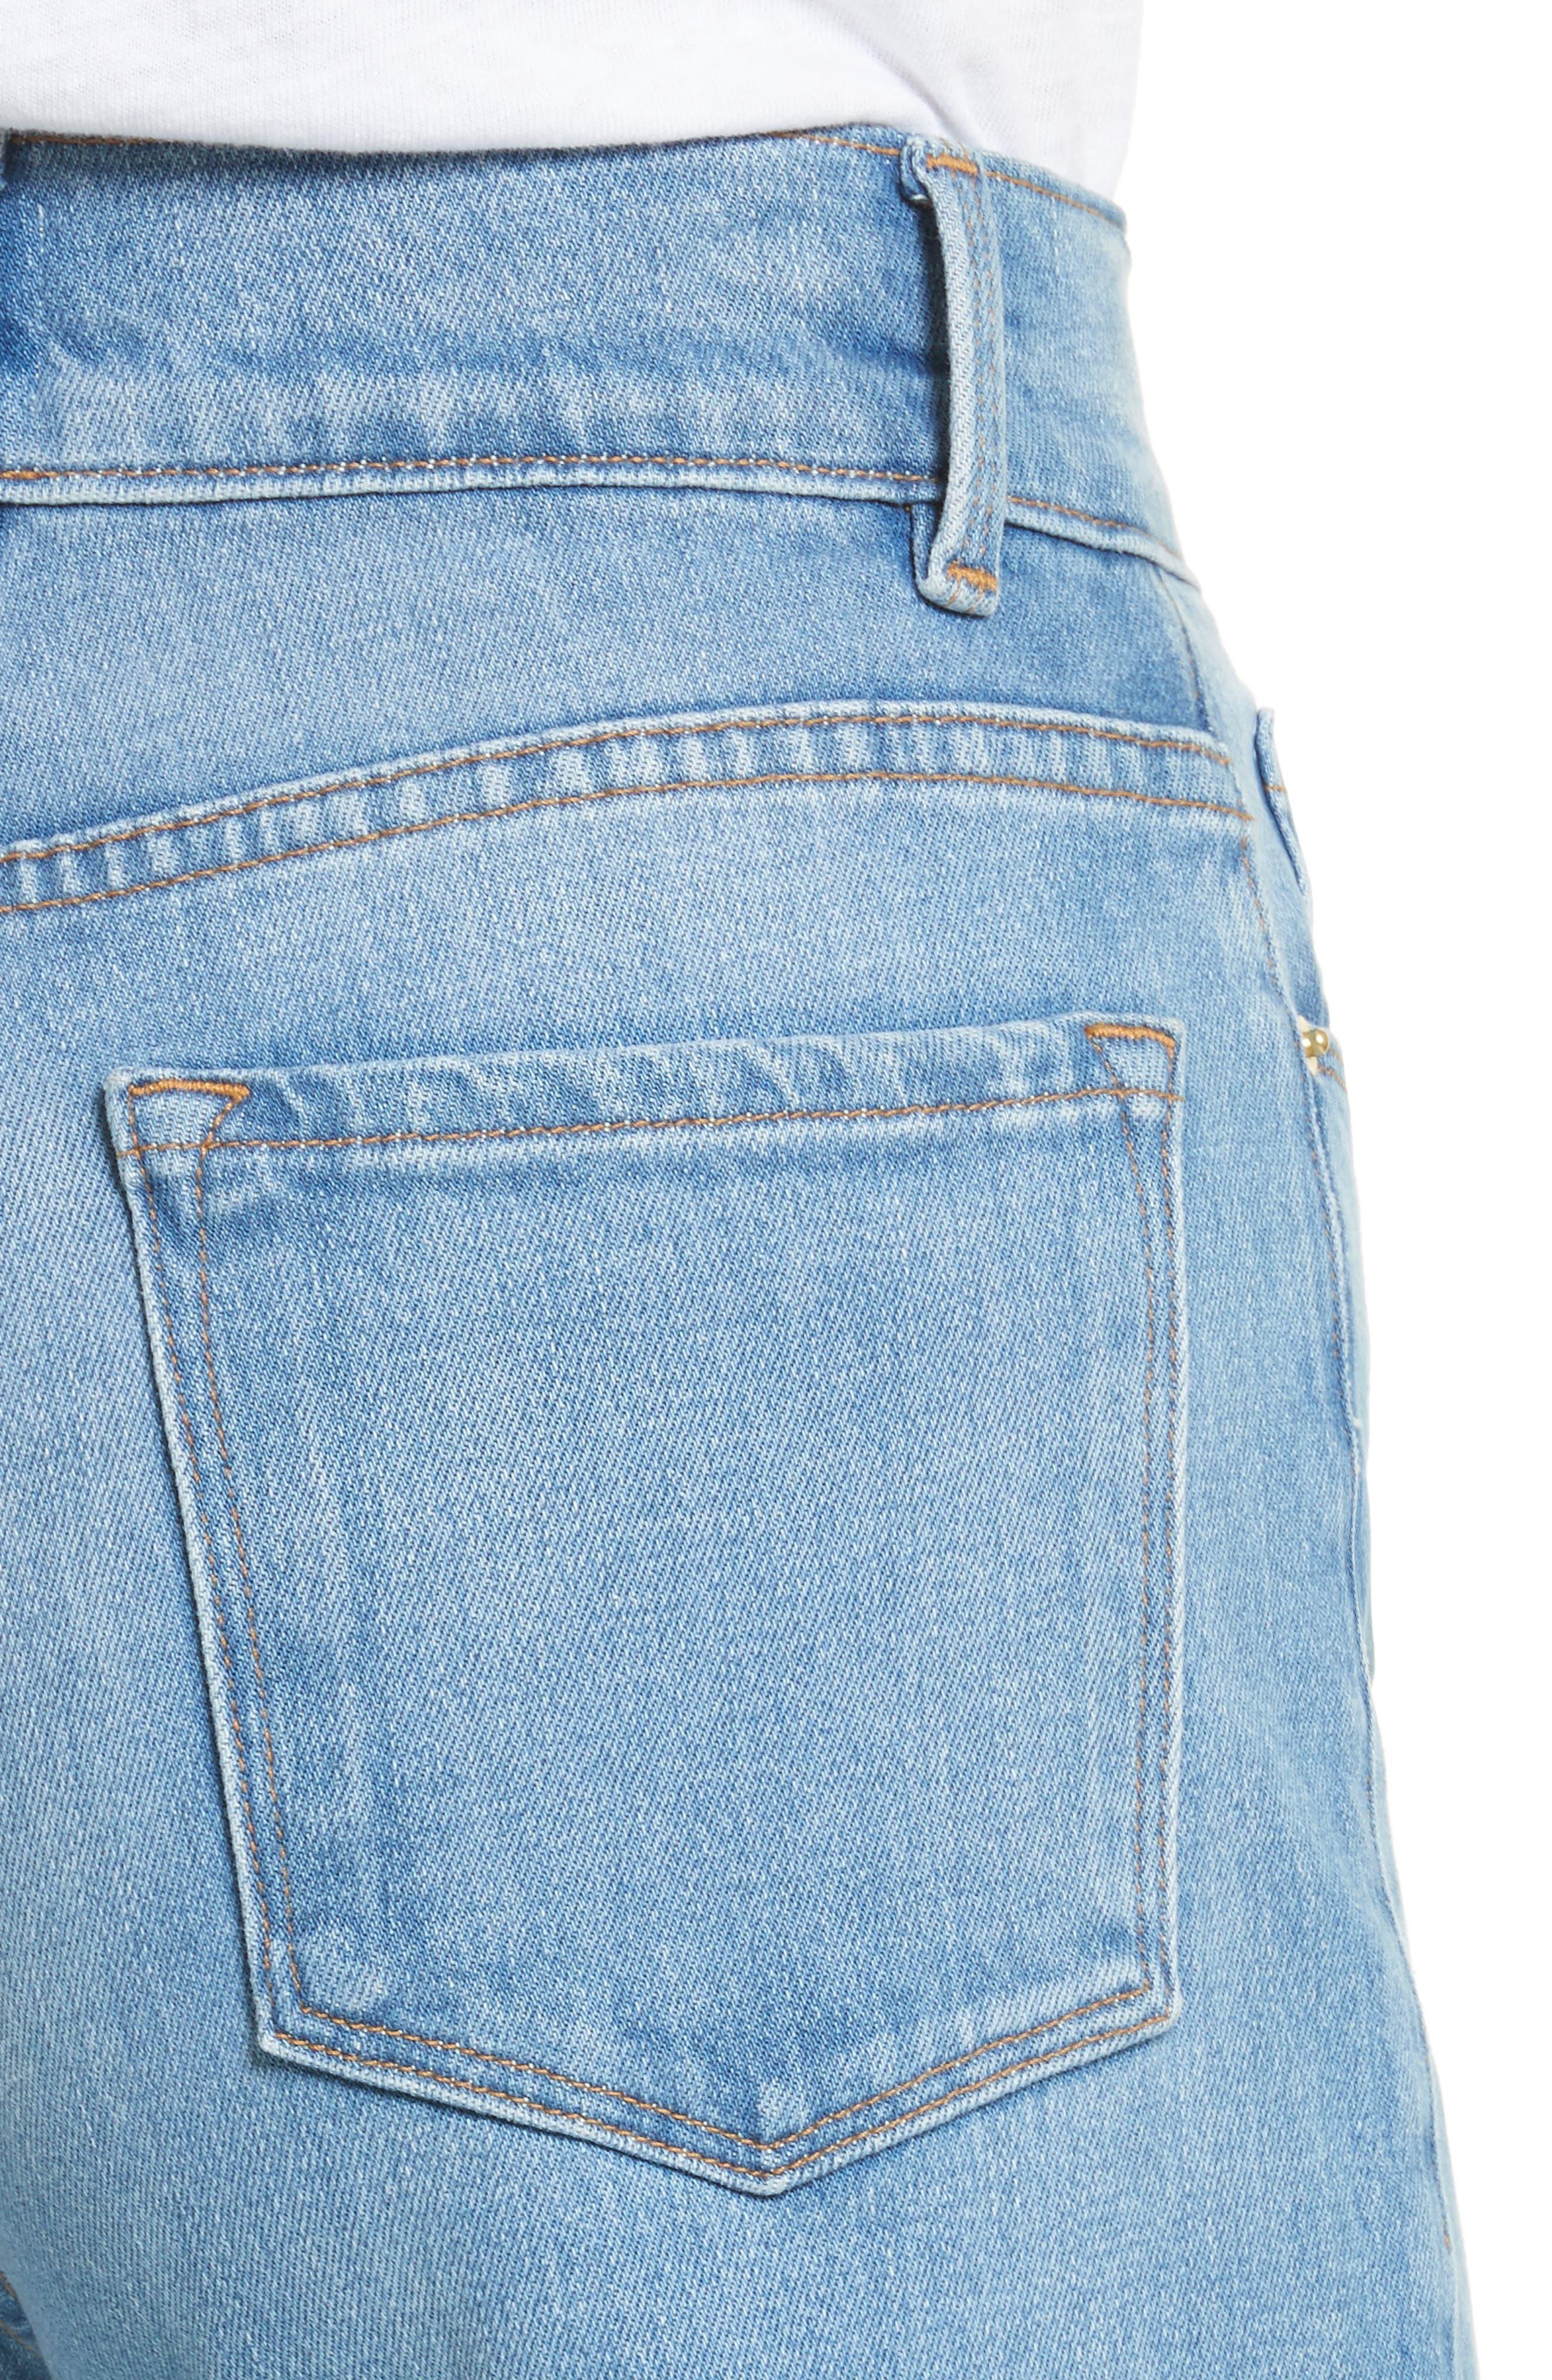 Le Palazzo High Waist Raw Edge Jeans,                             Alternate thumbnail 5, color,                             Opus